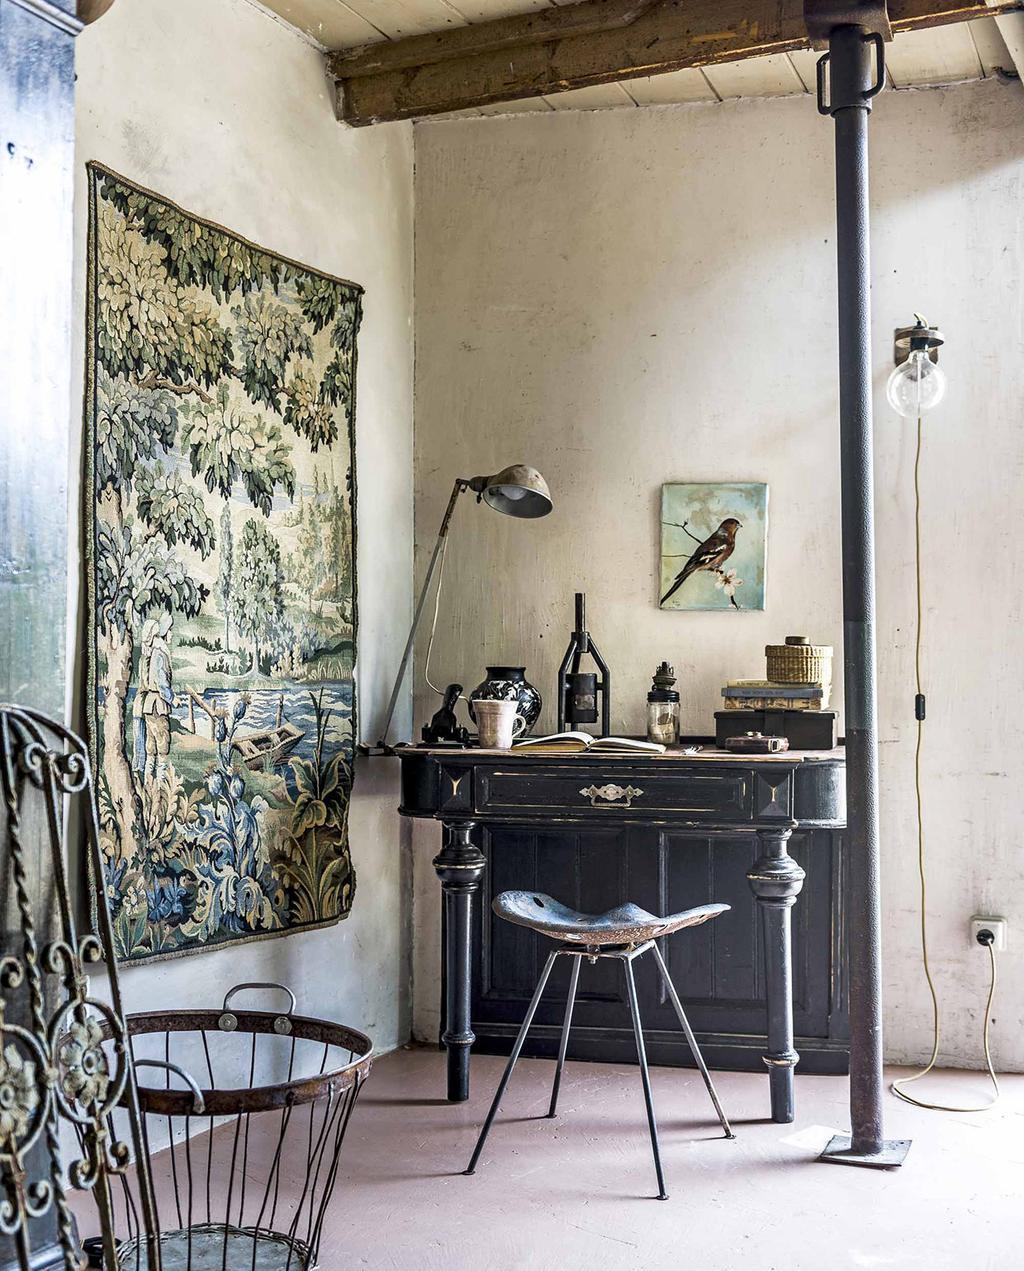 vtwonen 10-2016 | bureau met oude lamp en wandkleed